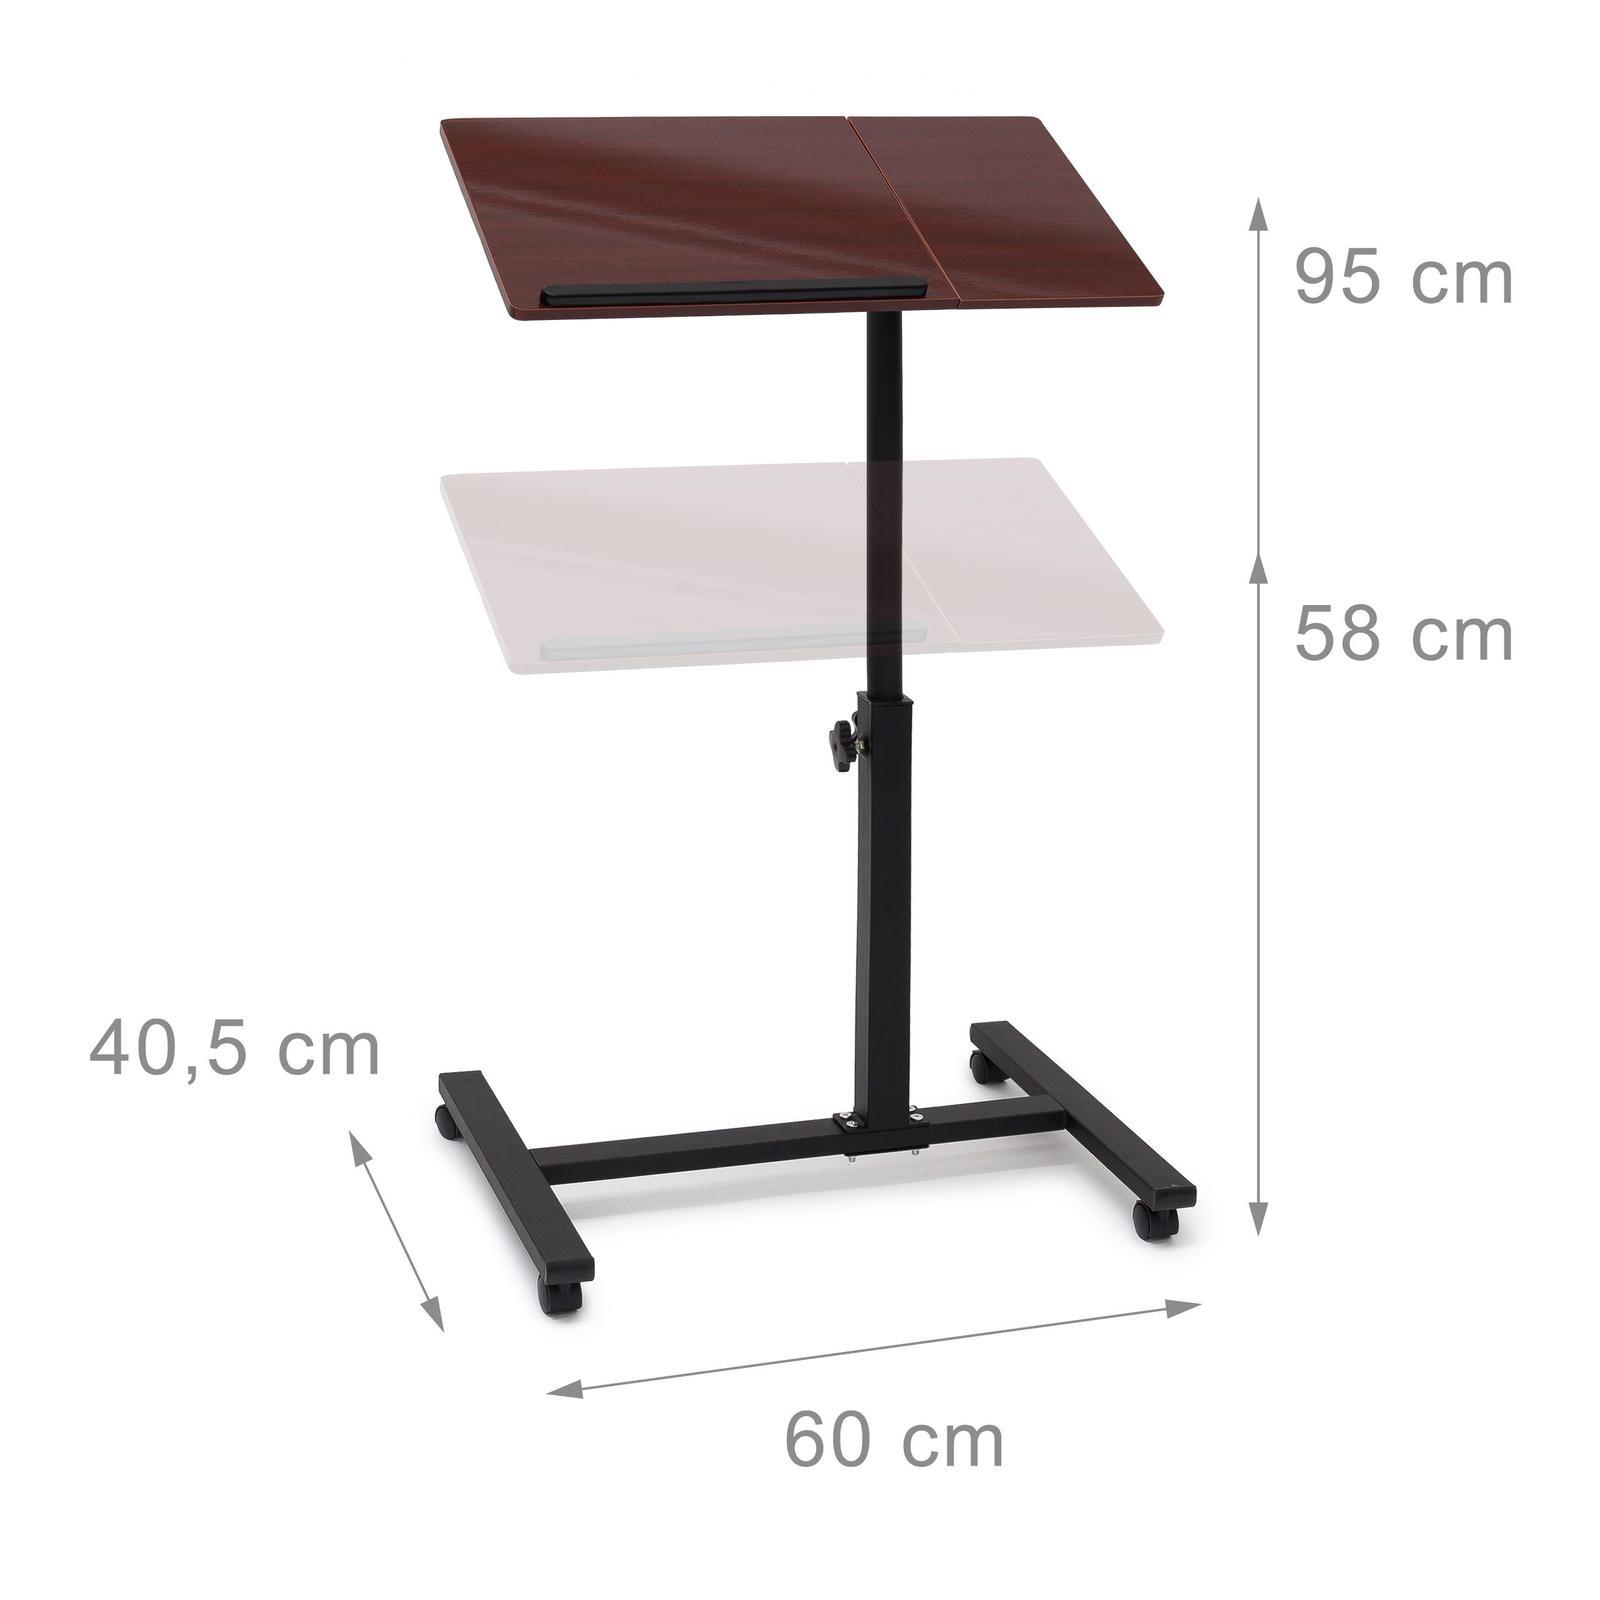 Stolík pre notebook, raňajkové stolíky - Obrázok č. 13